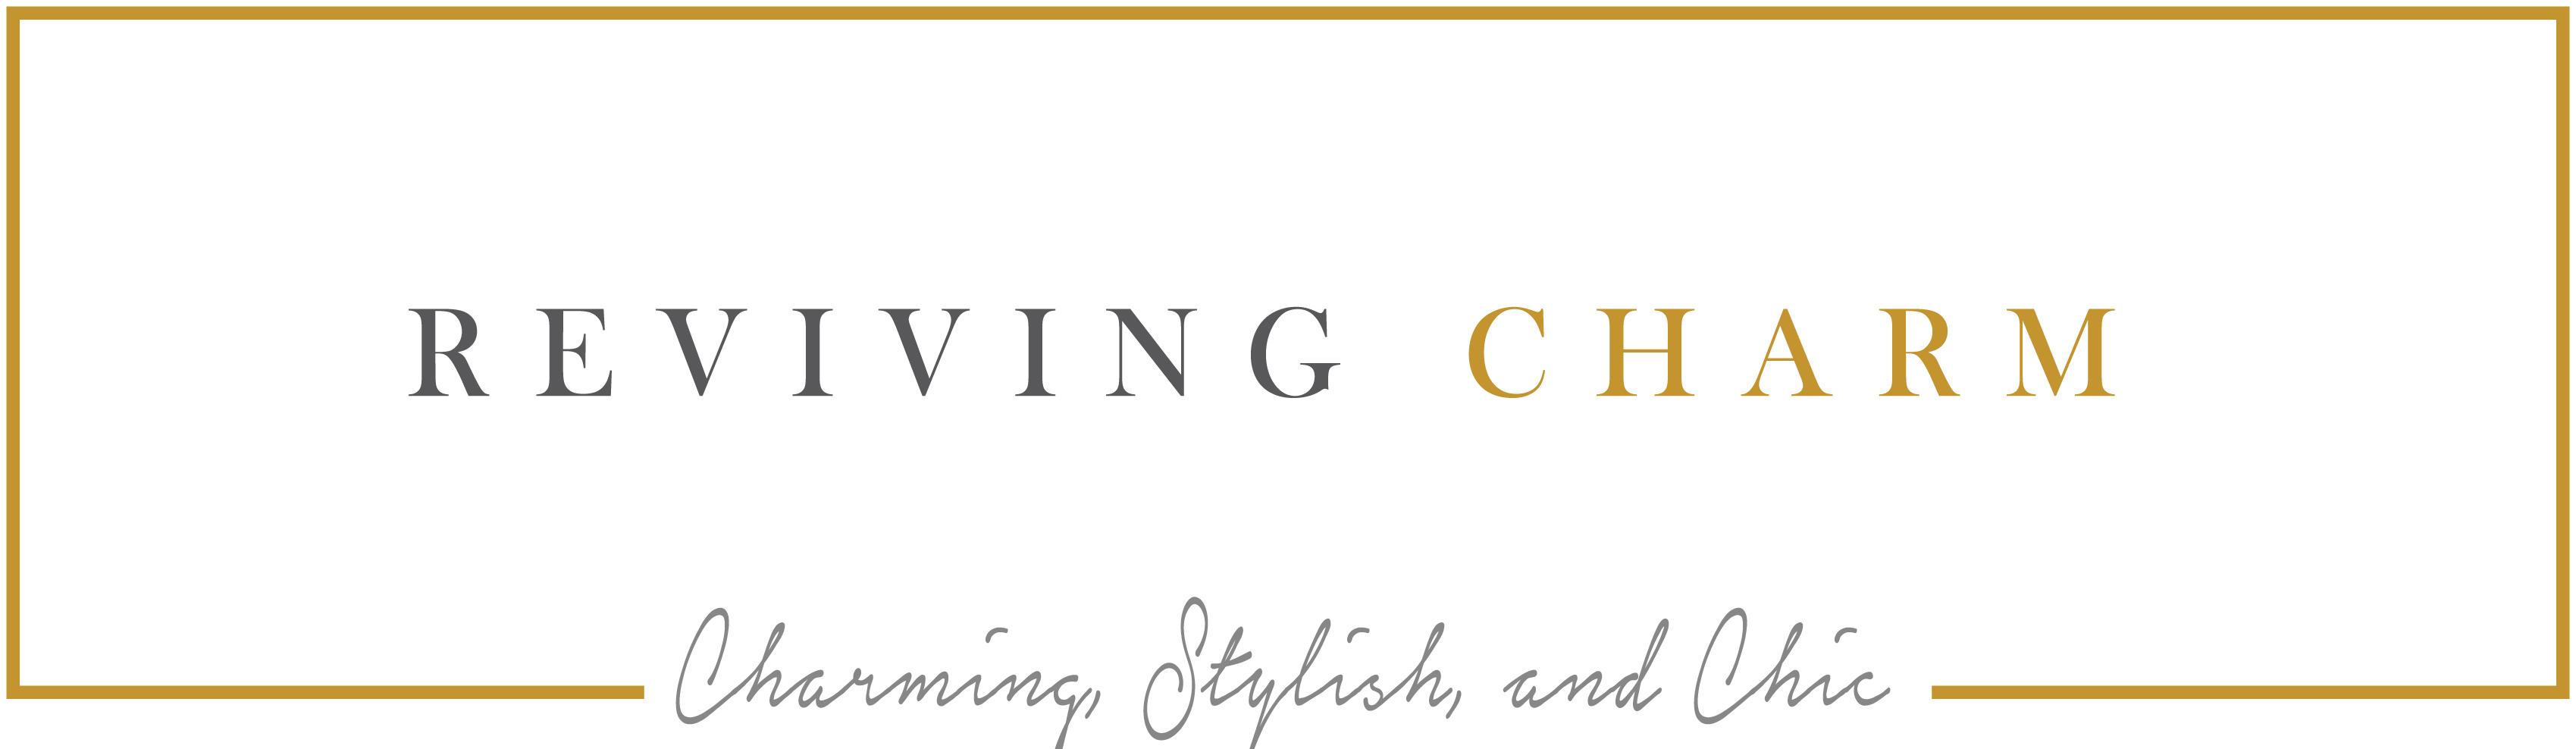 Reviving Charm